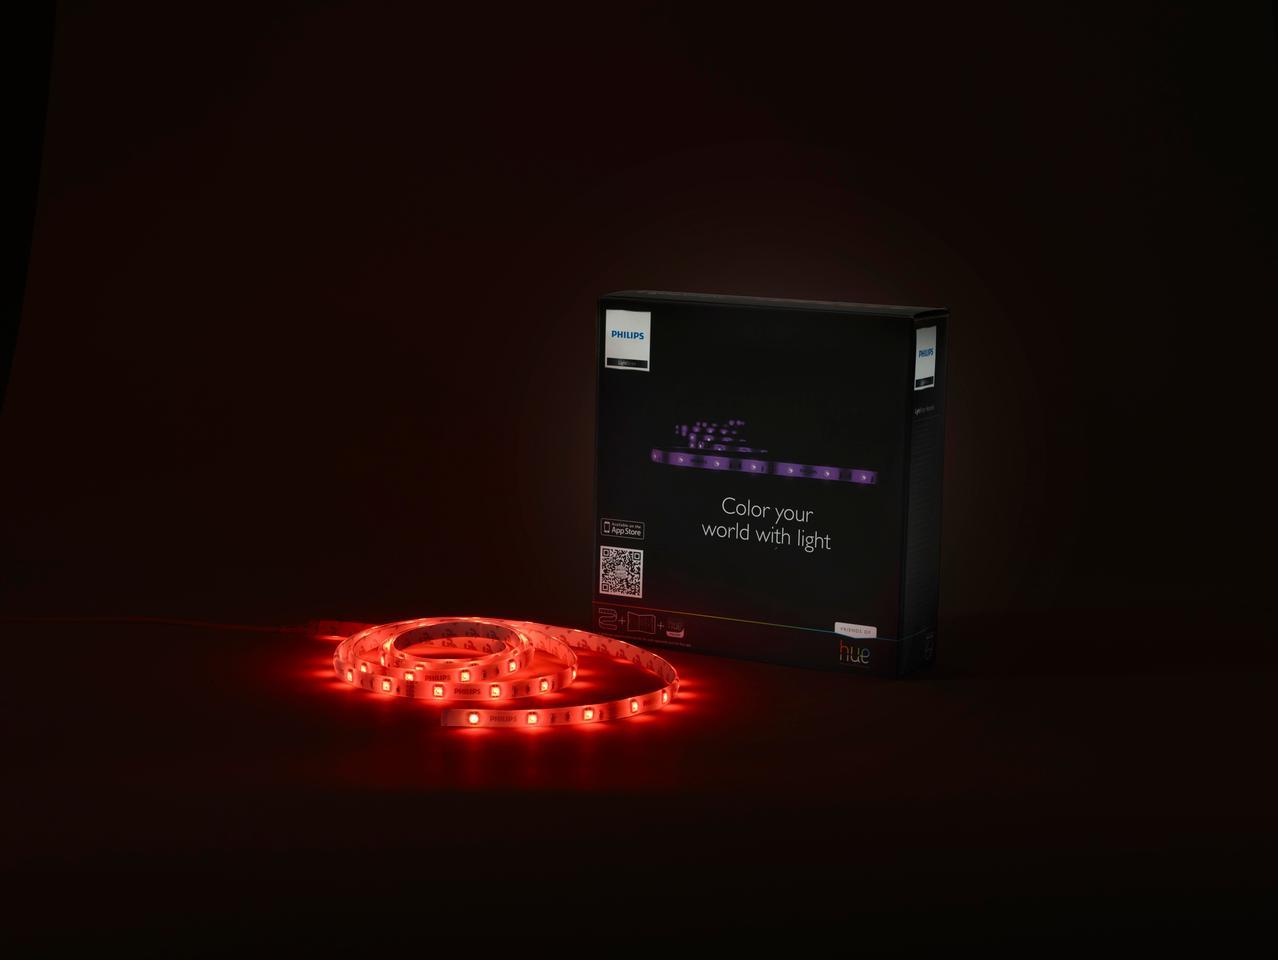 Philips' LightStrip